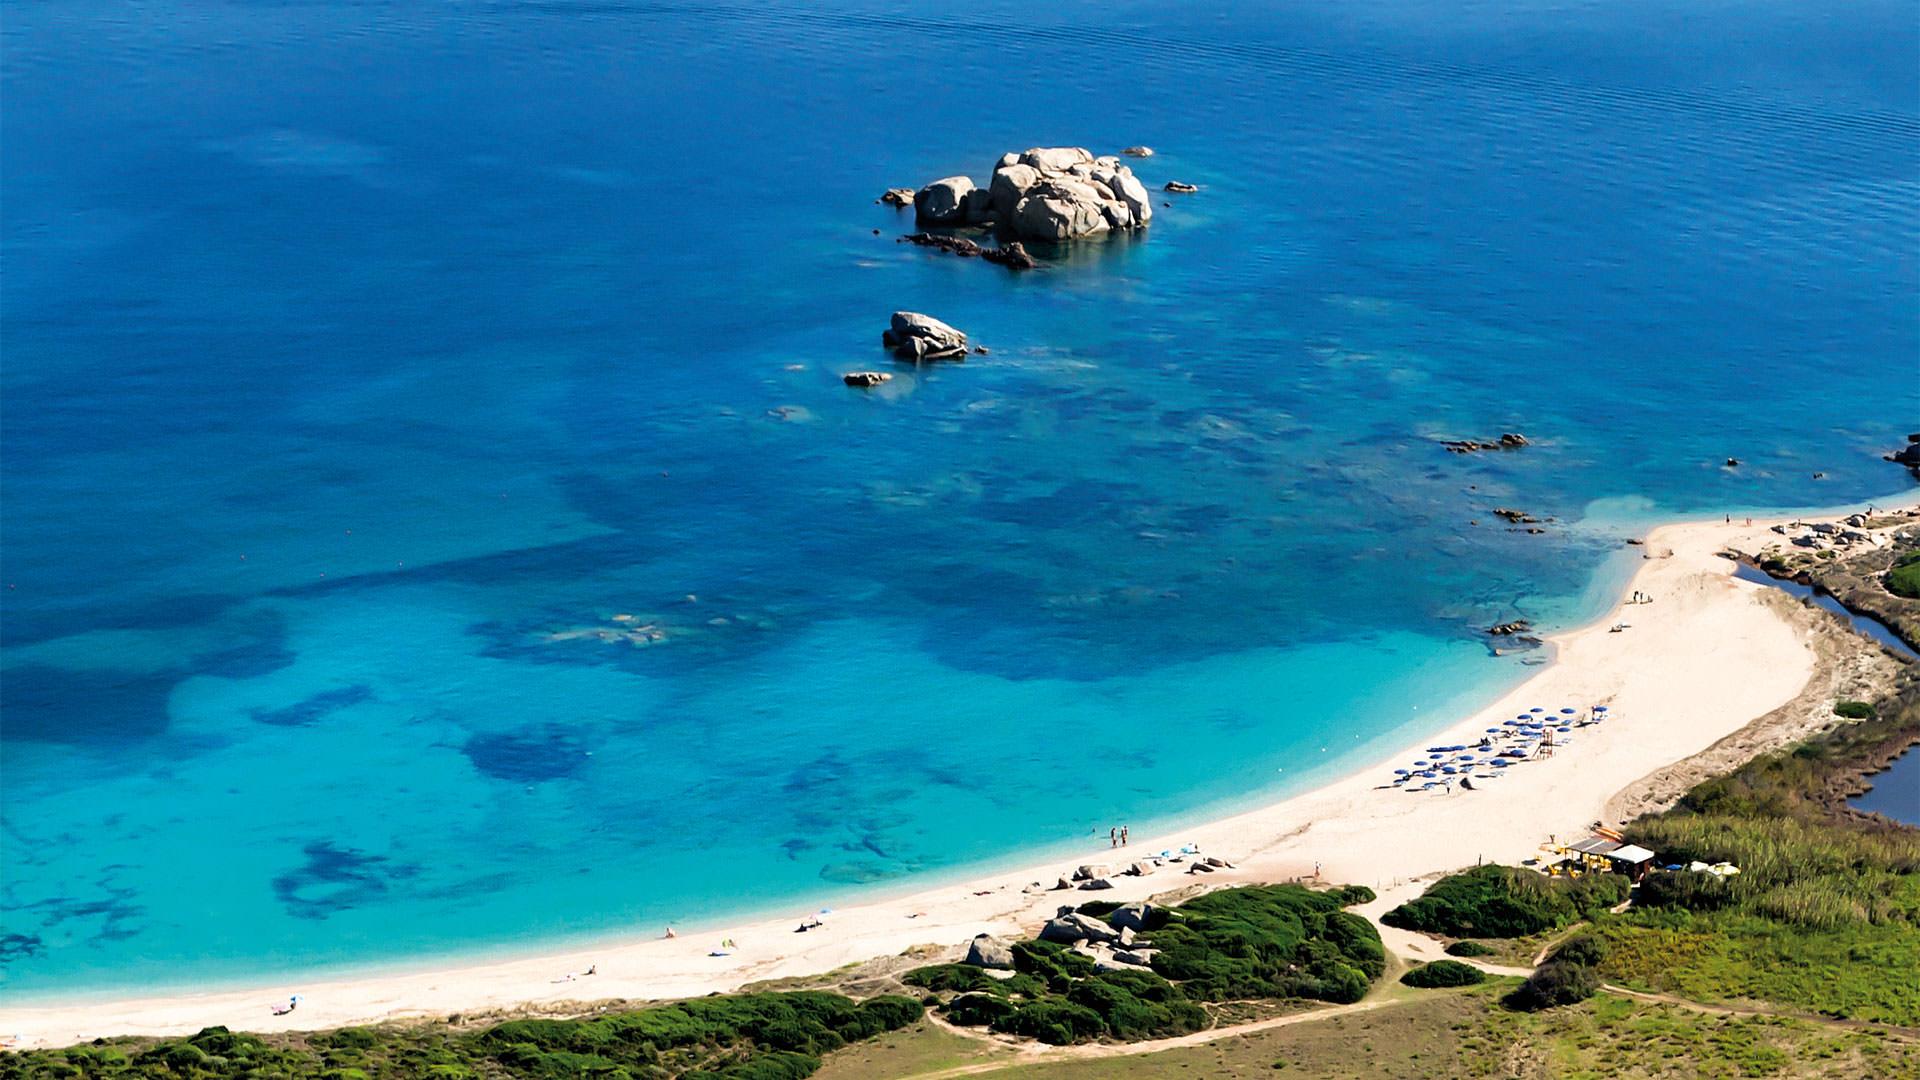 resort-valle-erica-slider-spiaggia-hotel-licciola-santa-teresa-gallura-sardegna-mini